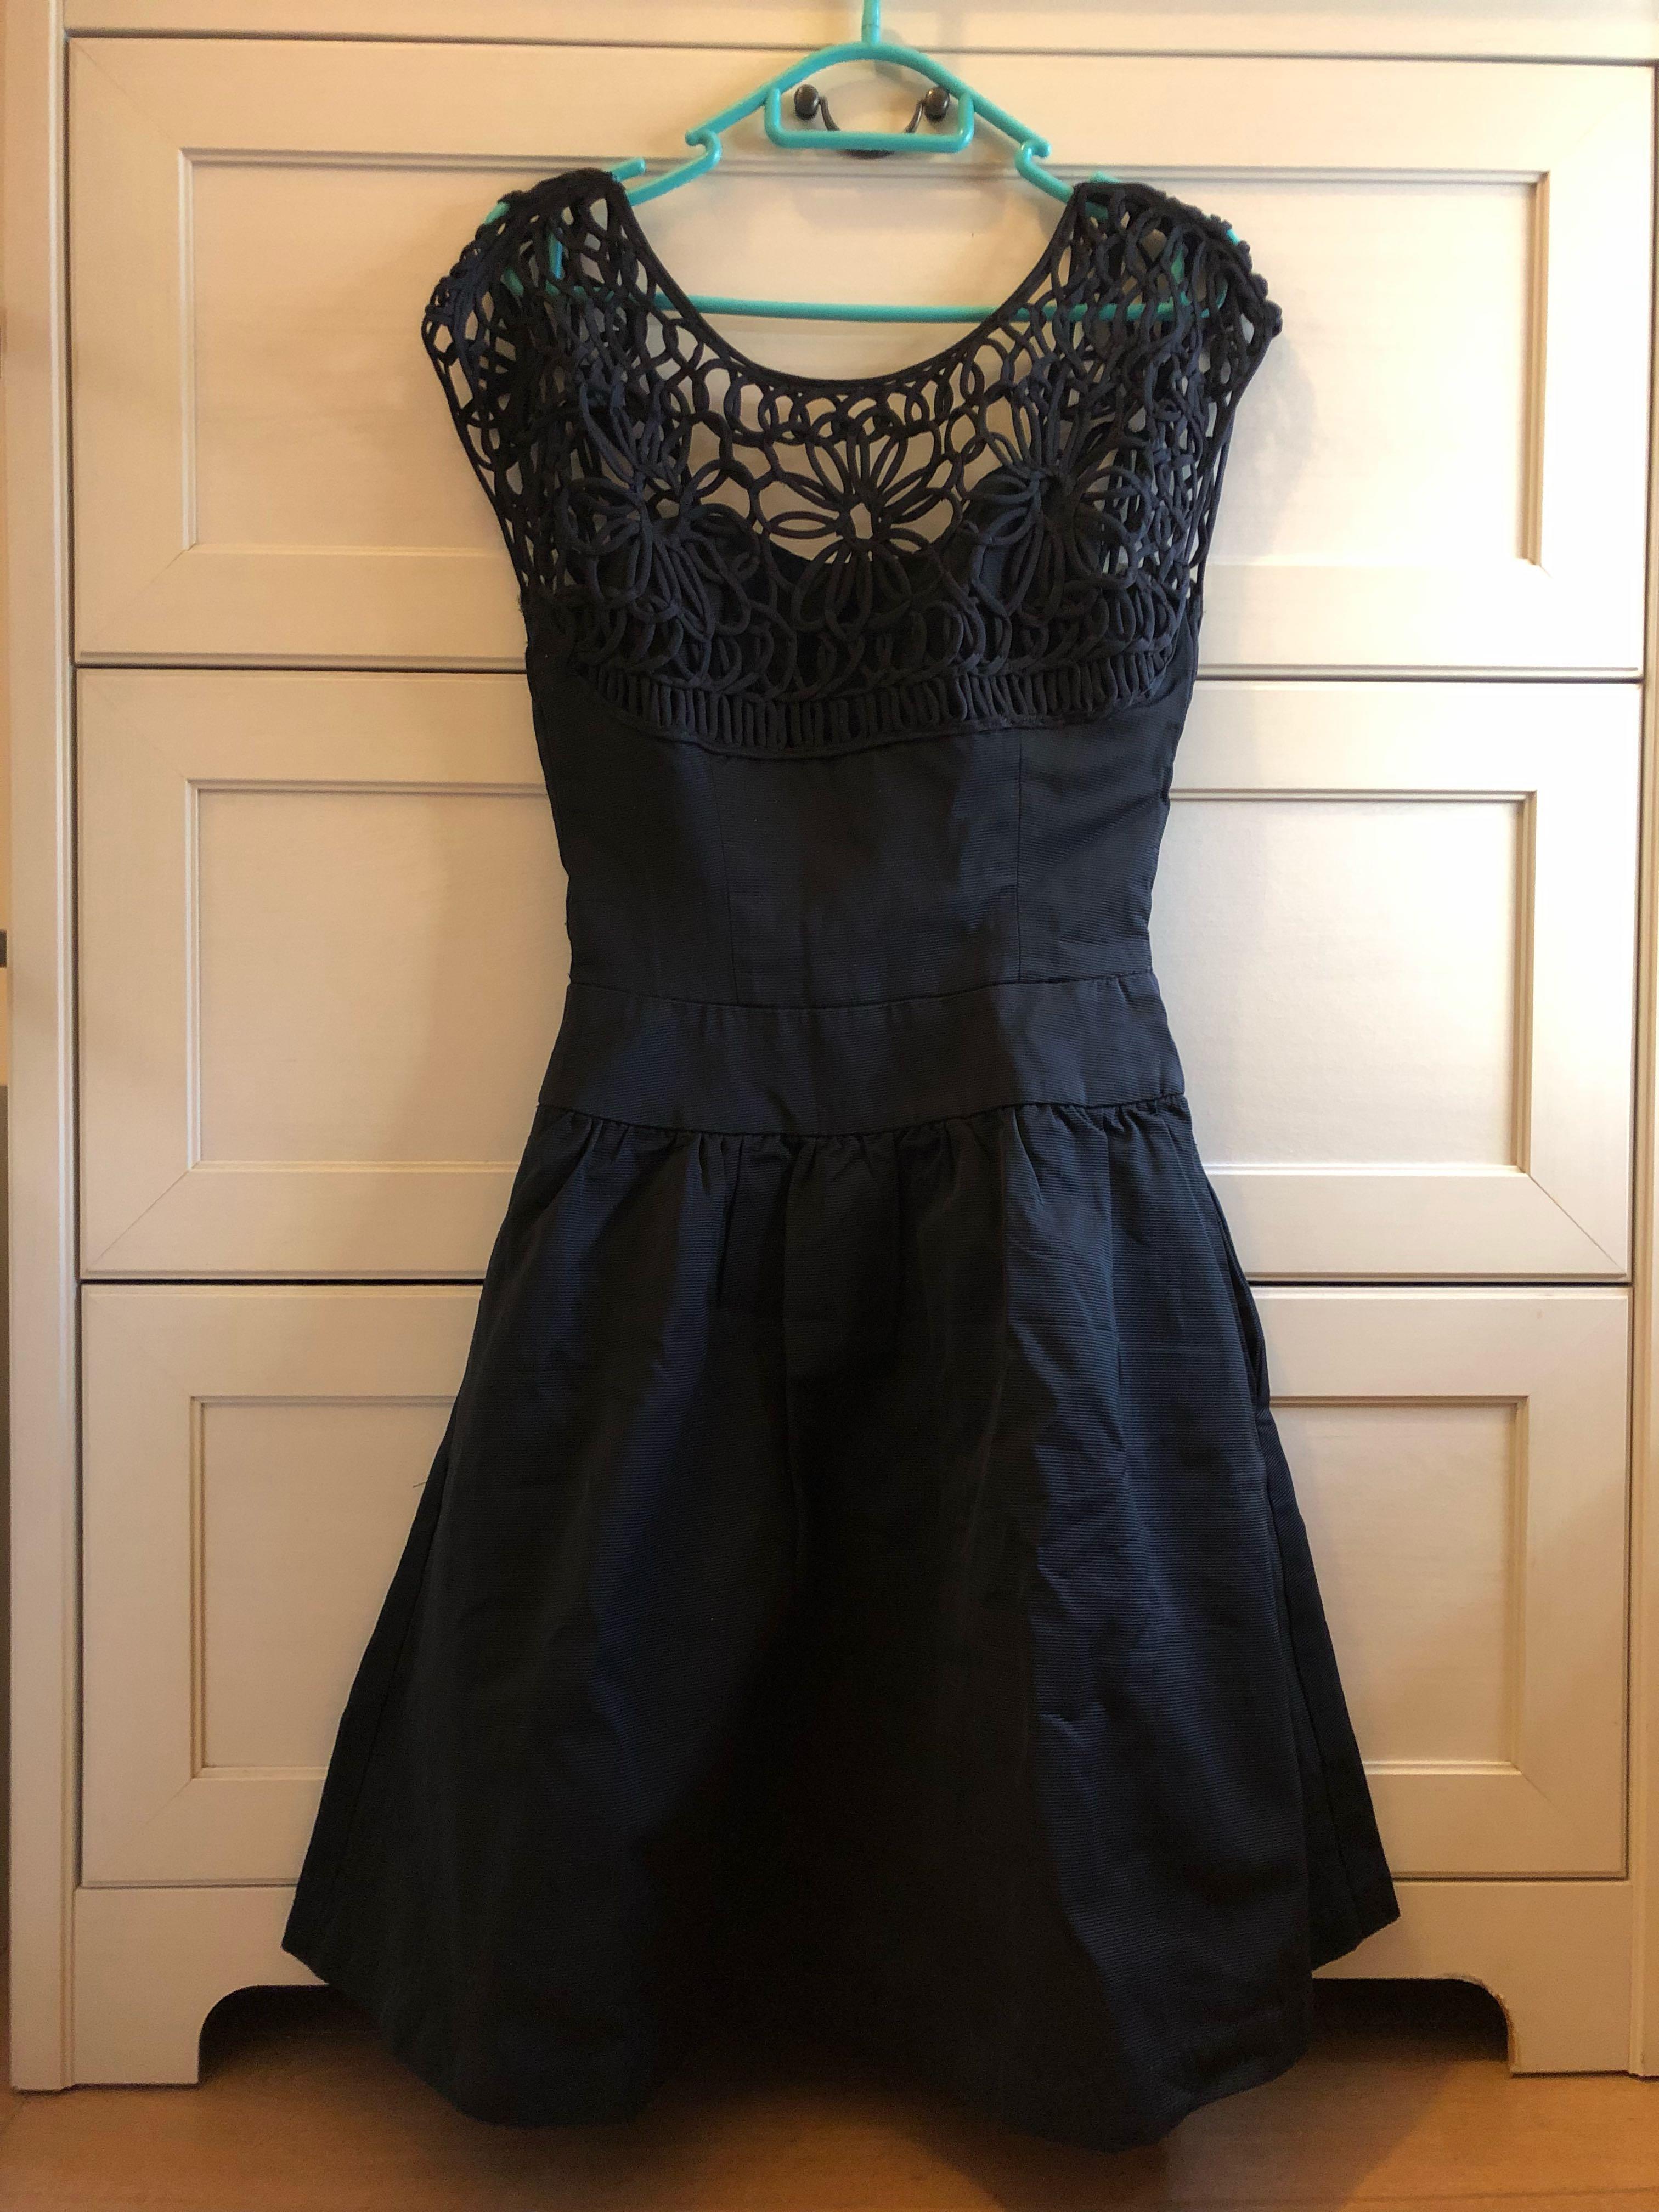 100% new Reiss crochet little black dress